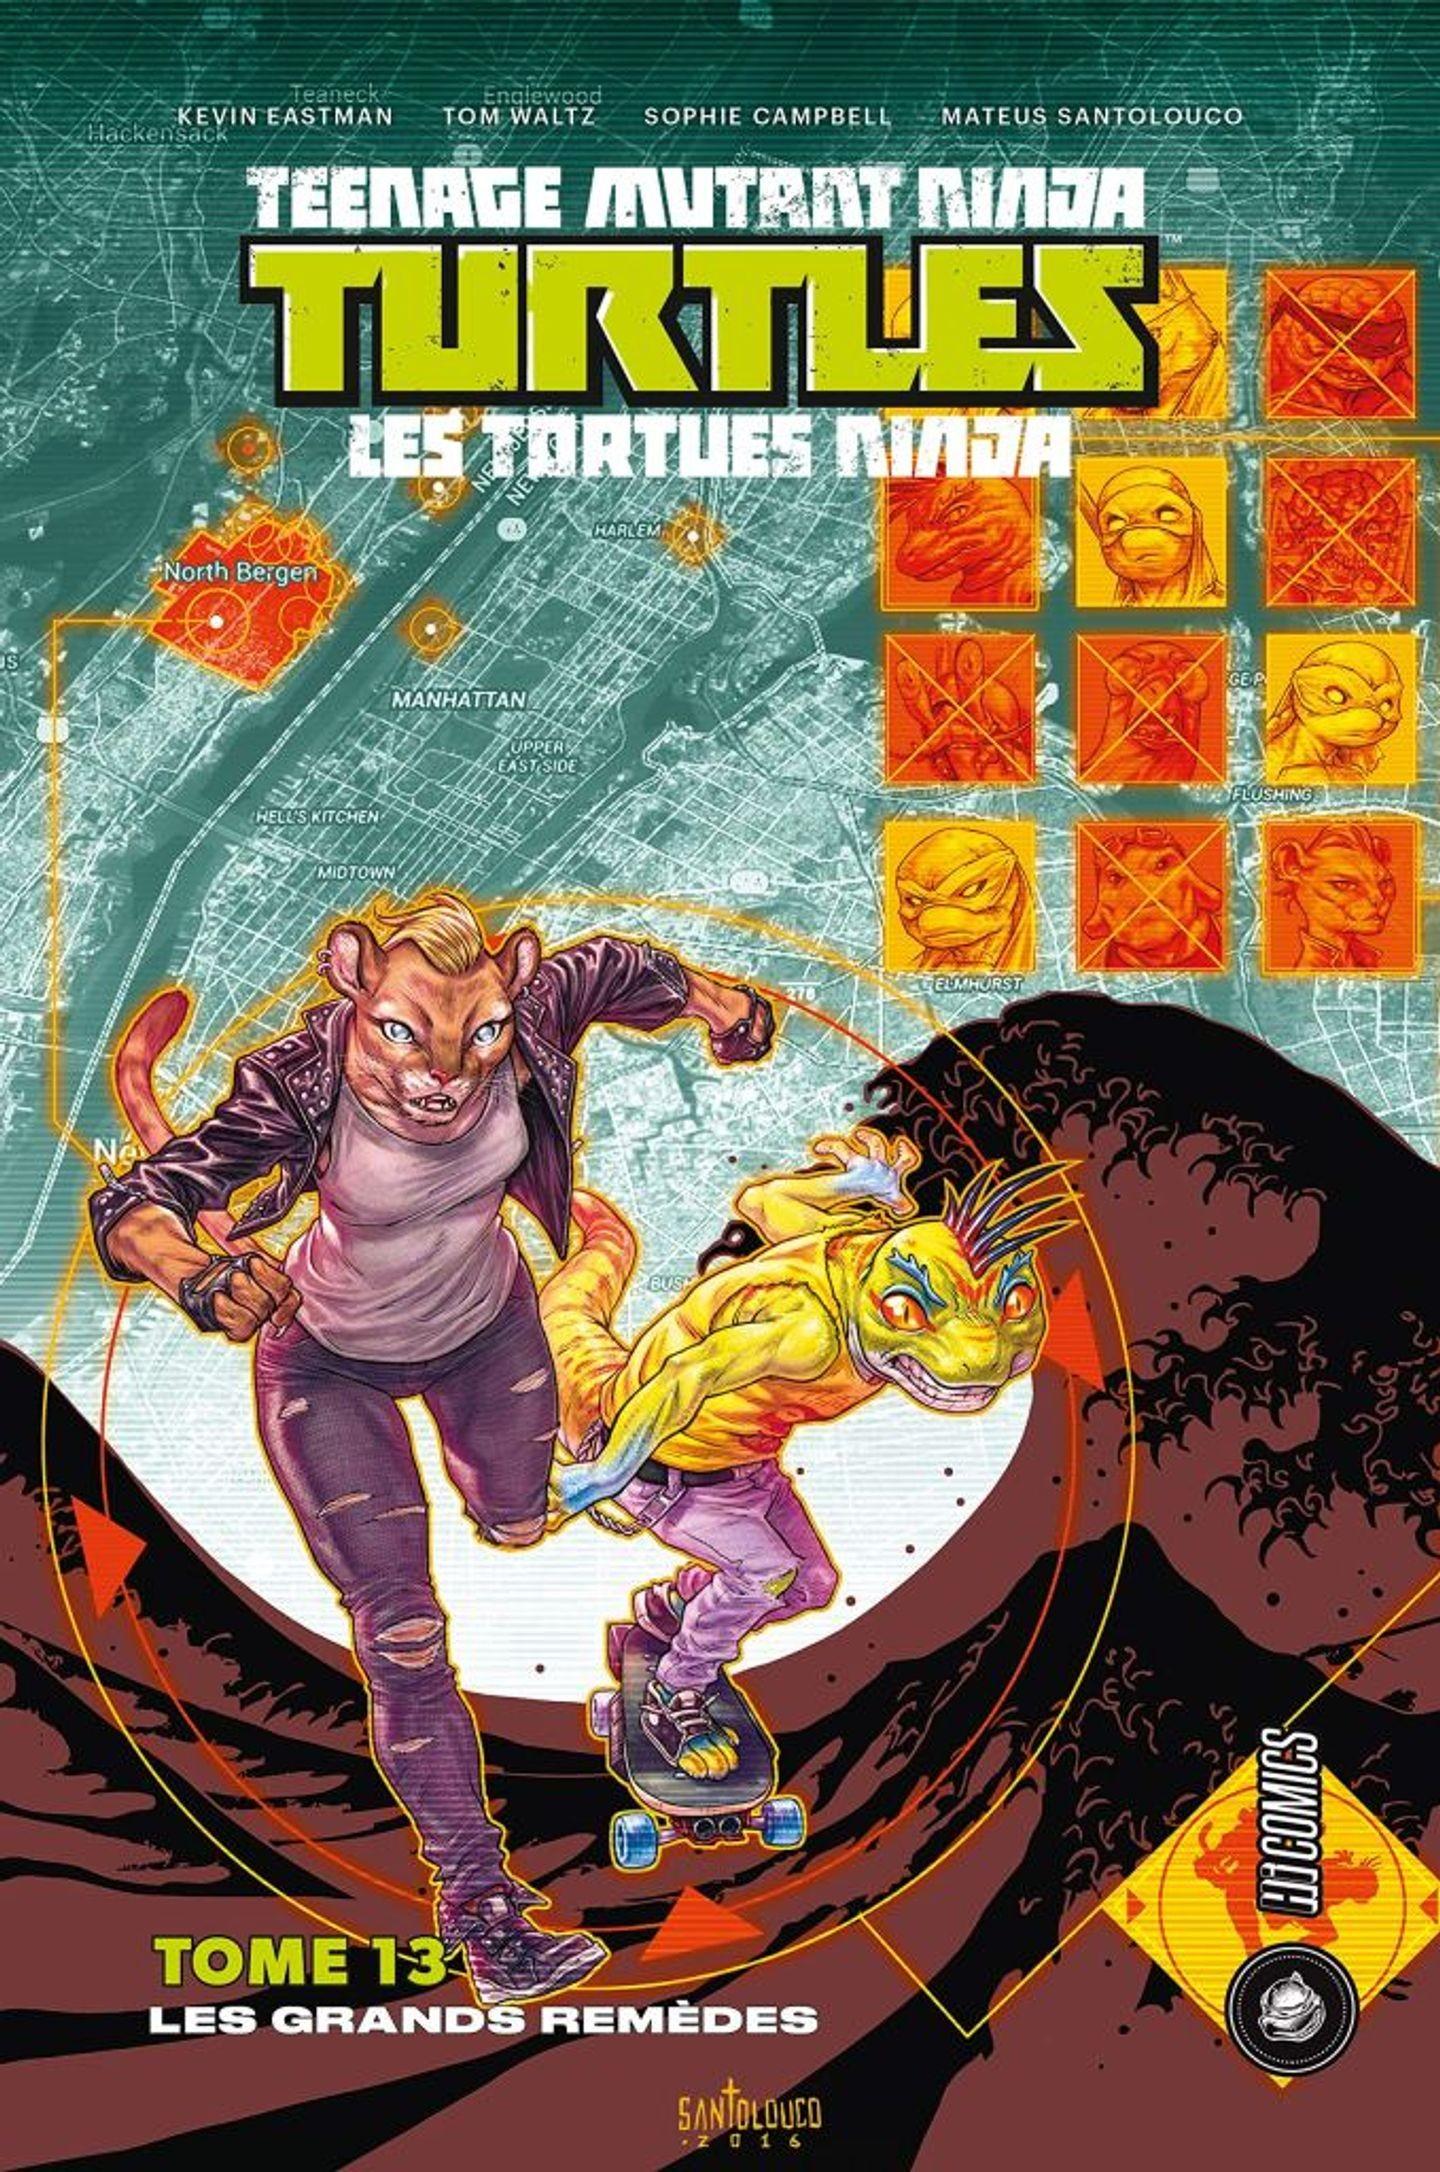 TMNT Tortues Ninja - Tome 13 (VF)